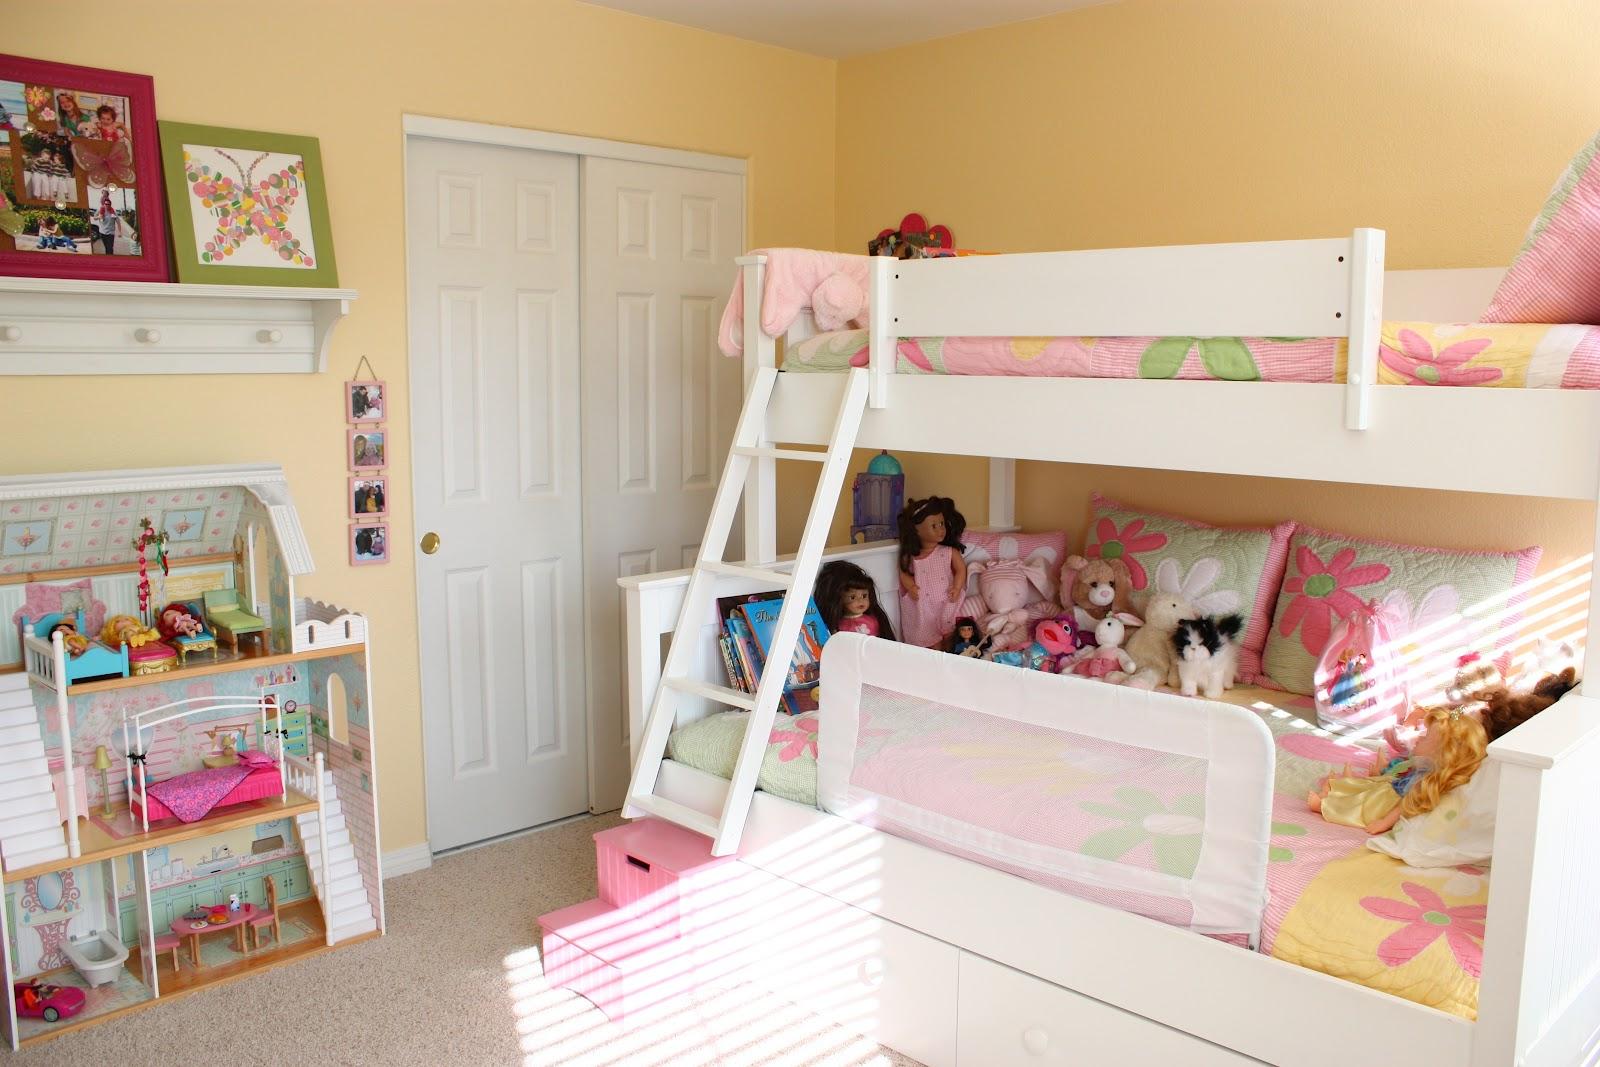 Organized Bookshelf & Girls' Room